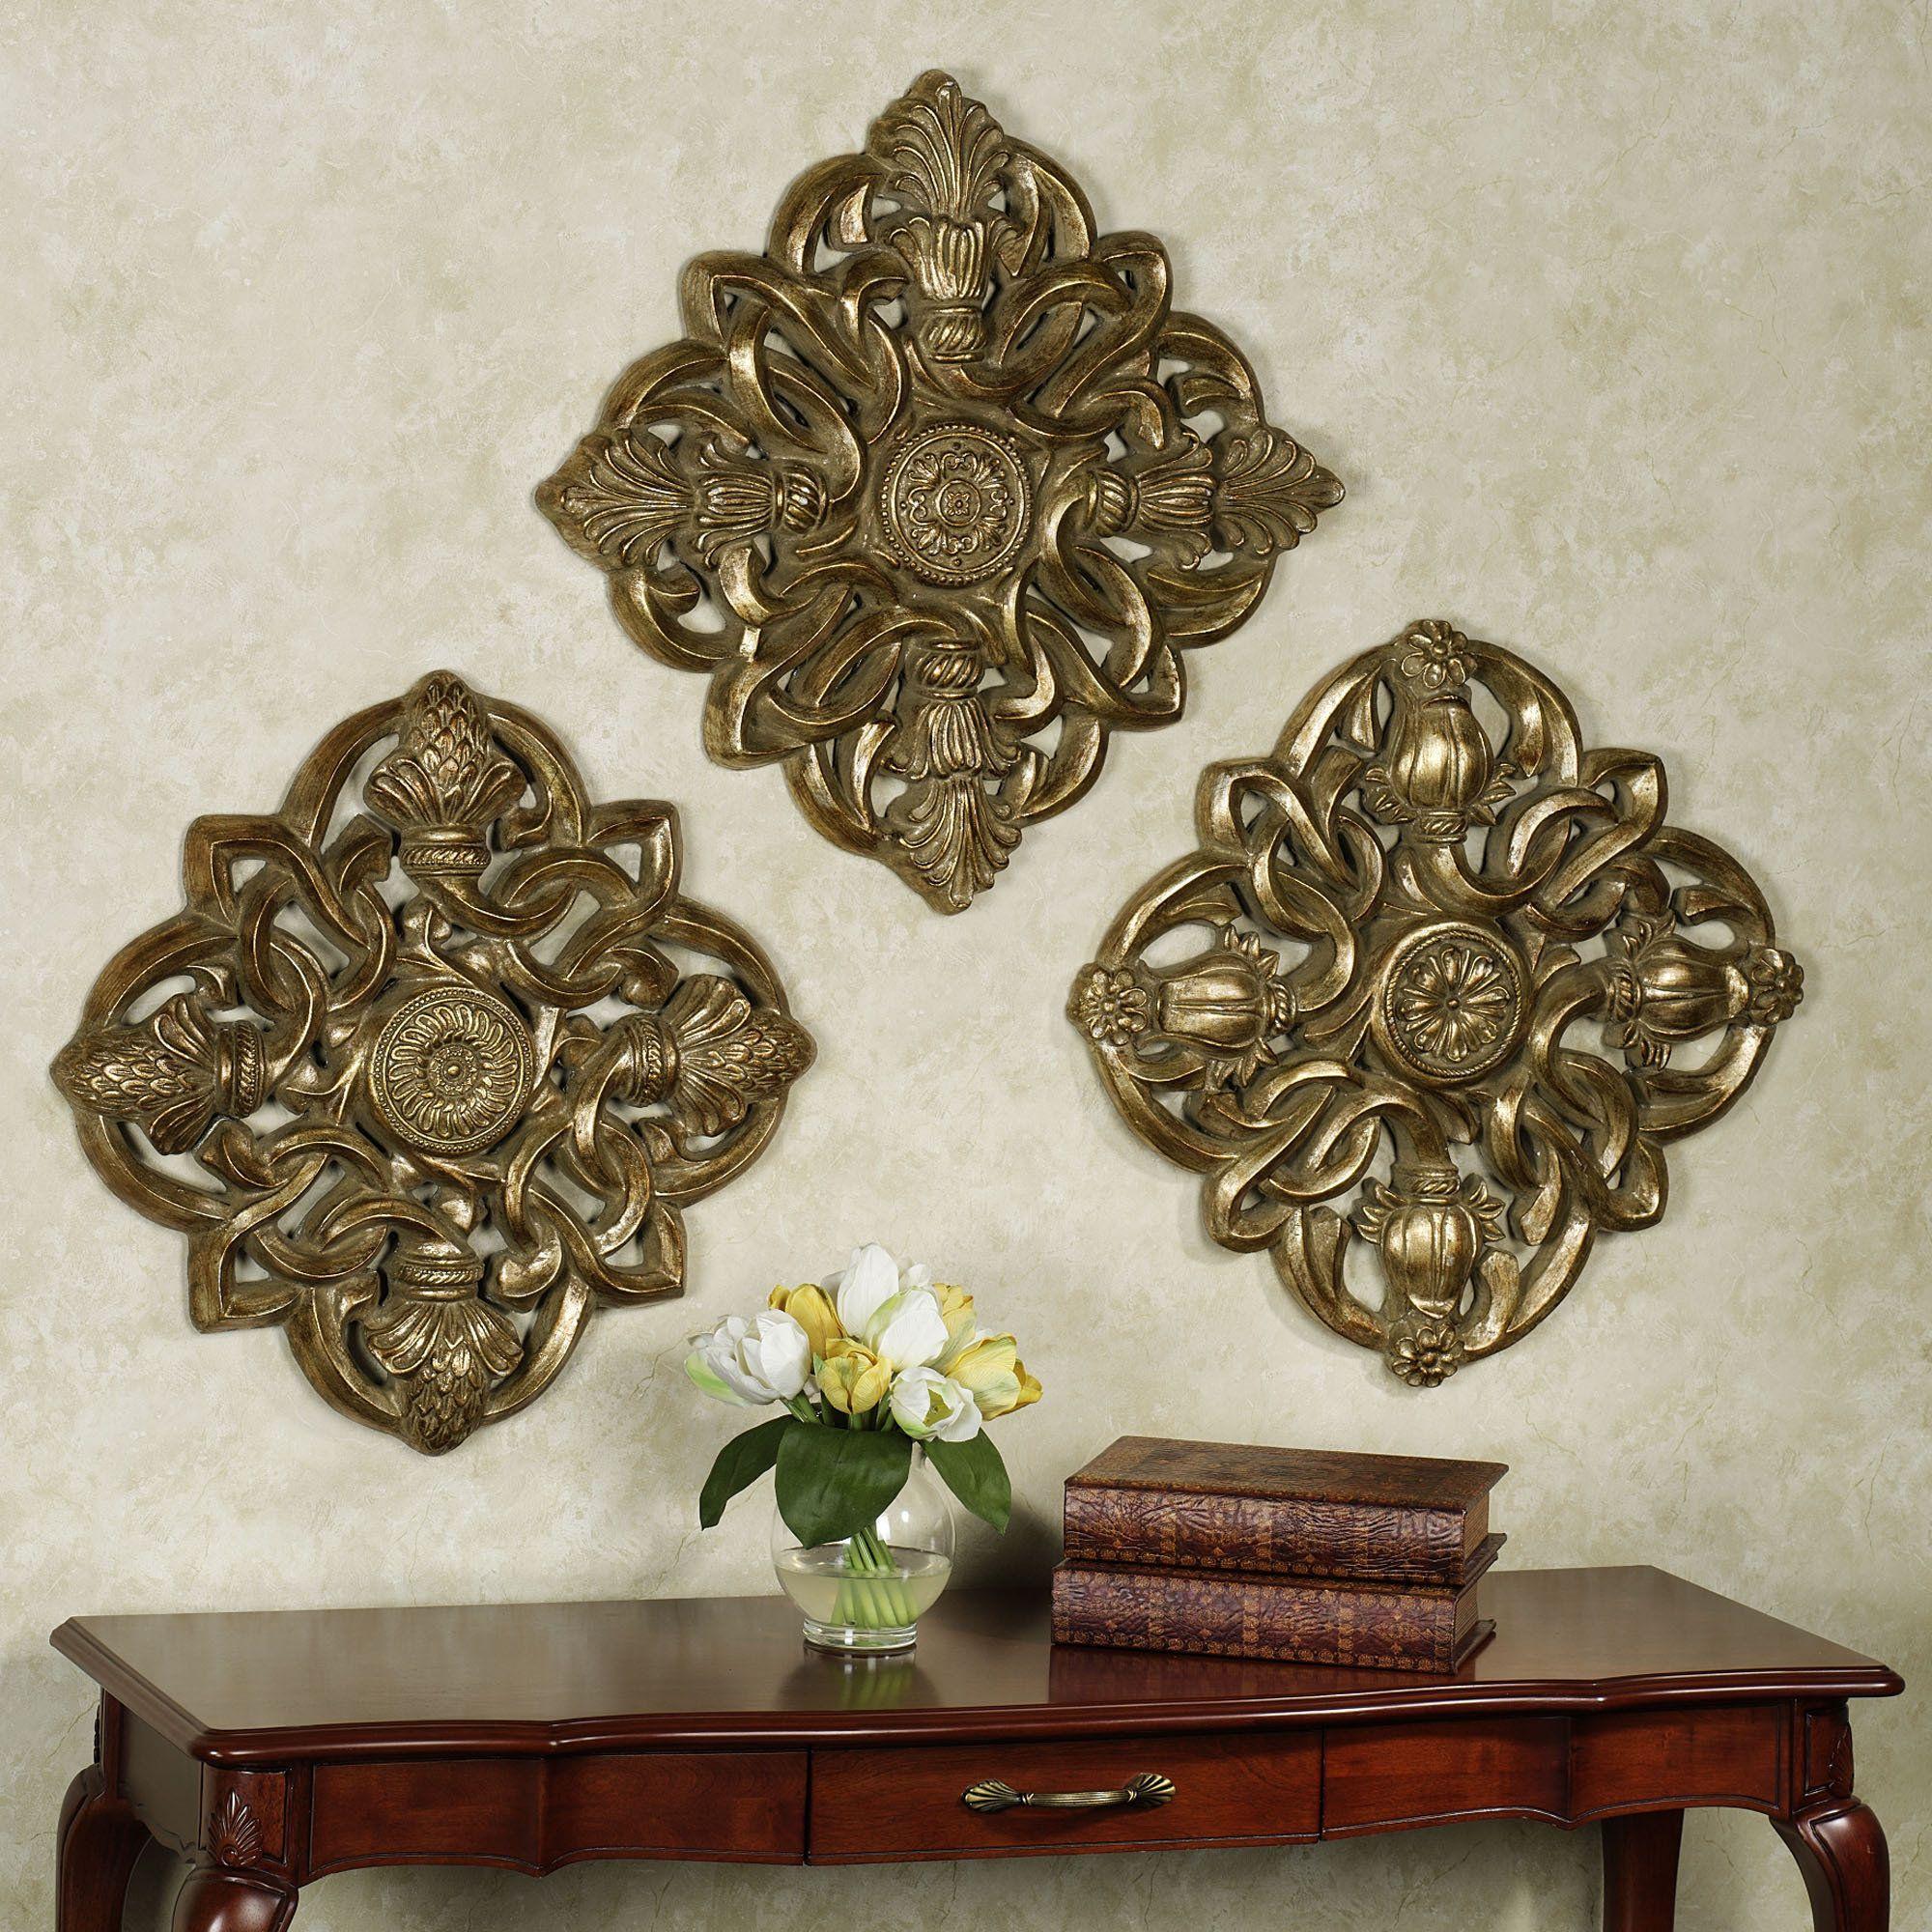 Decorative Wall Plaques greyson medallion wall plaque set | decorative walls, third and walls